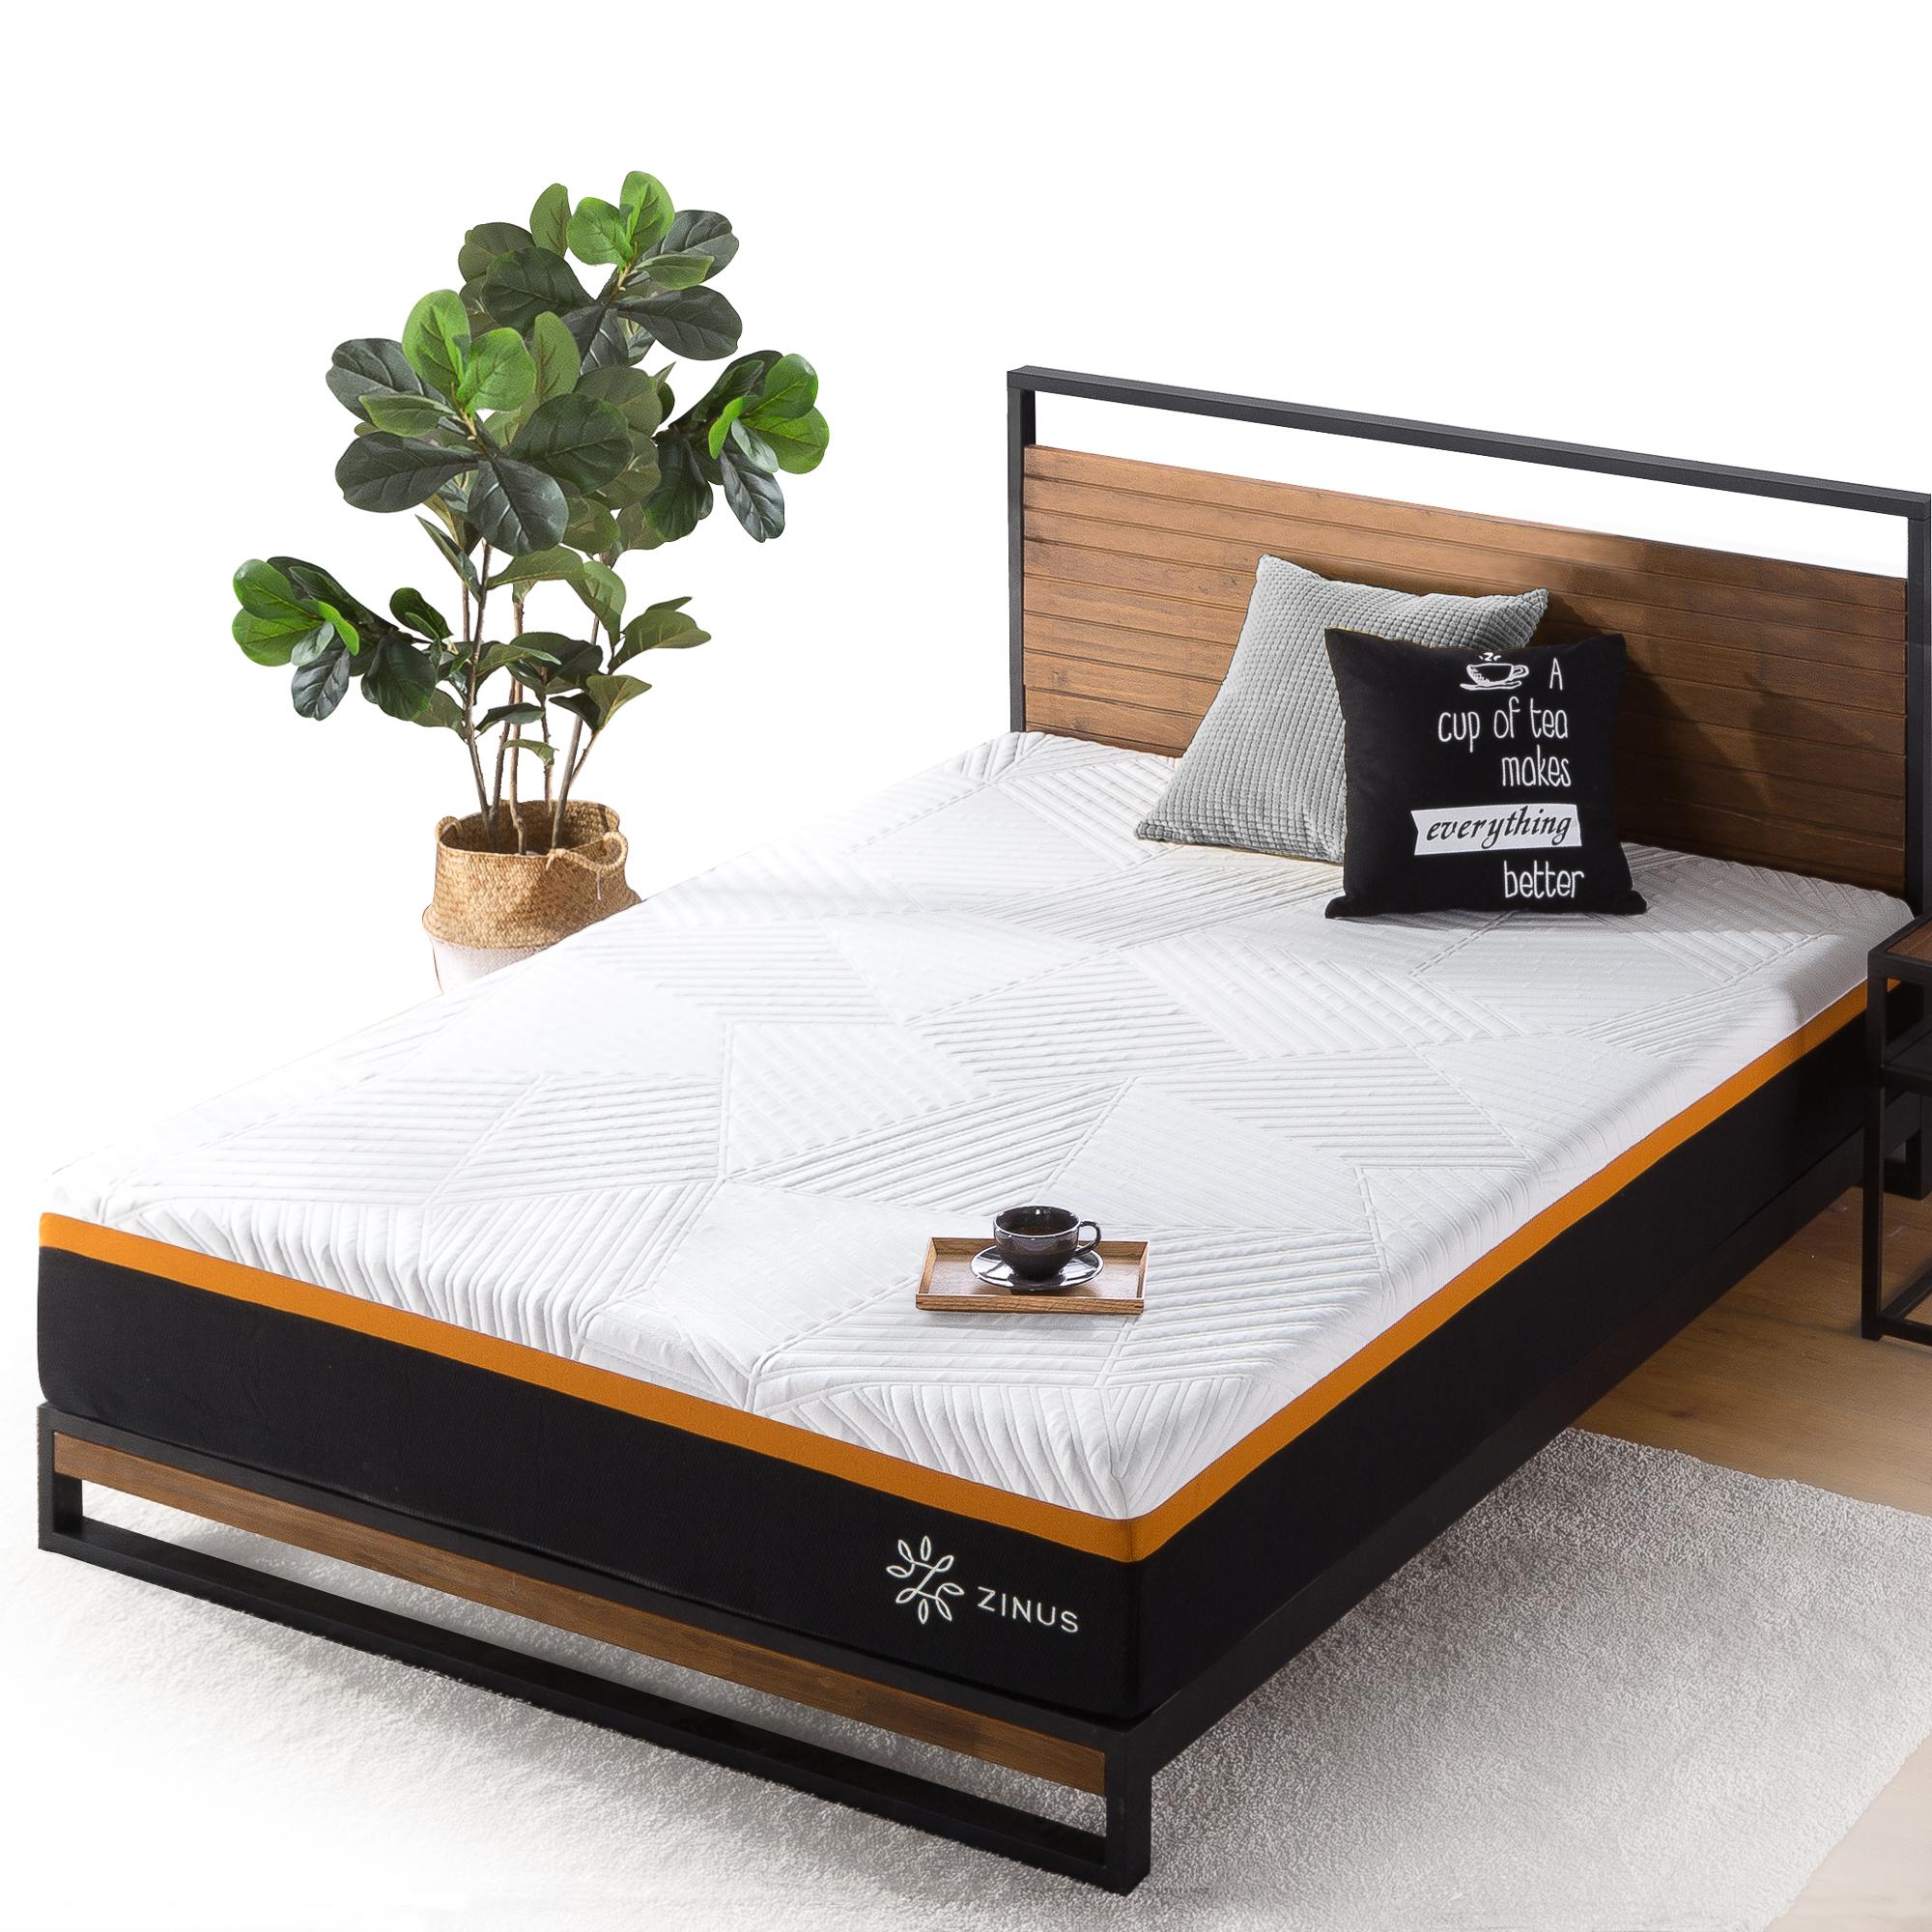 thumbnail 88 - Zinus Mattress Queen Double King Single Bed Memory Foam Pocket Spring Hybrid